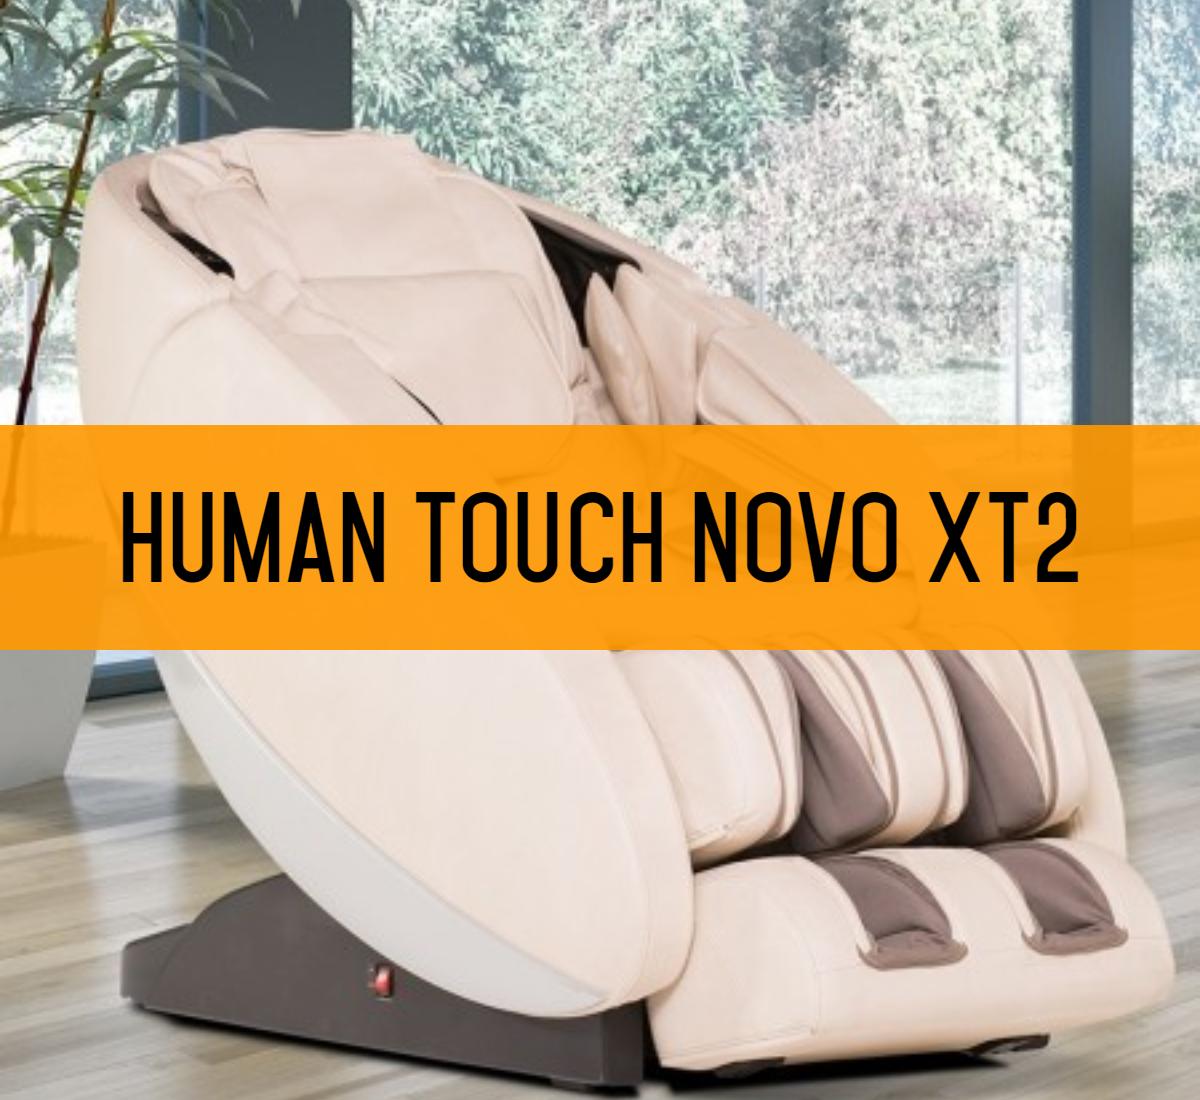 Human Touch Novo XT2